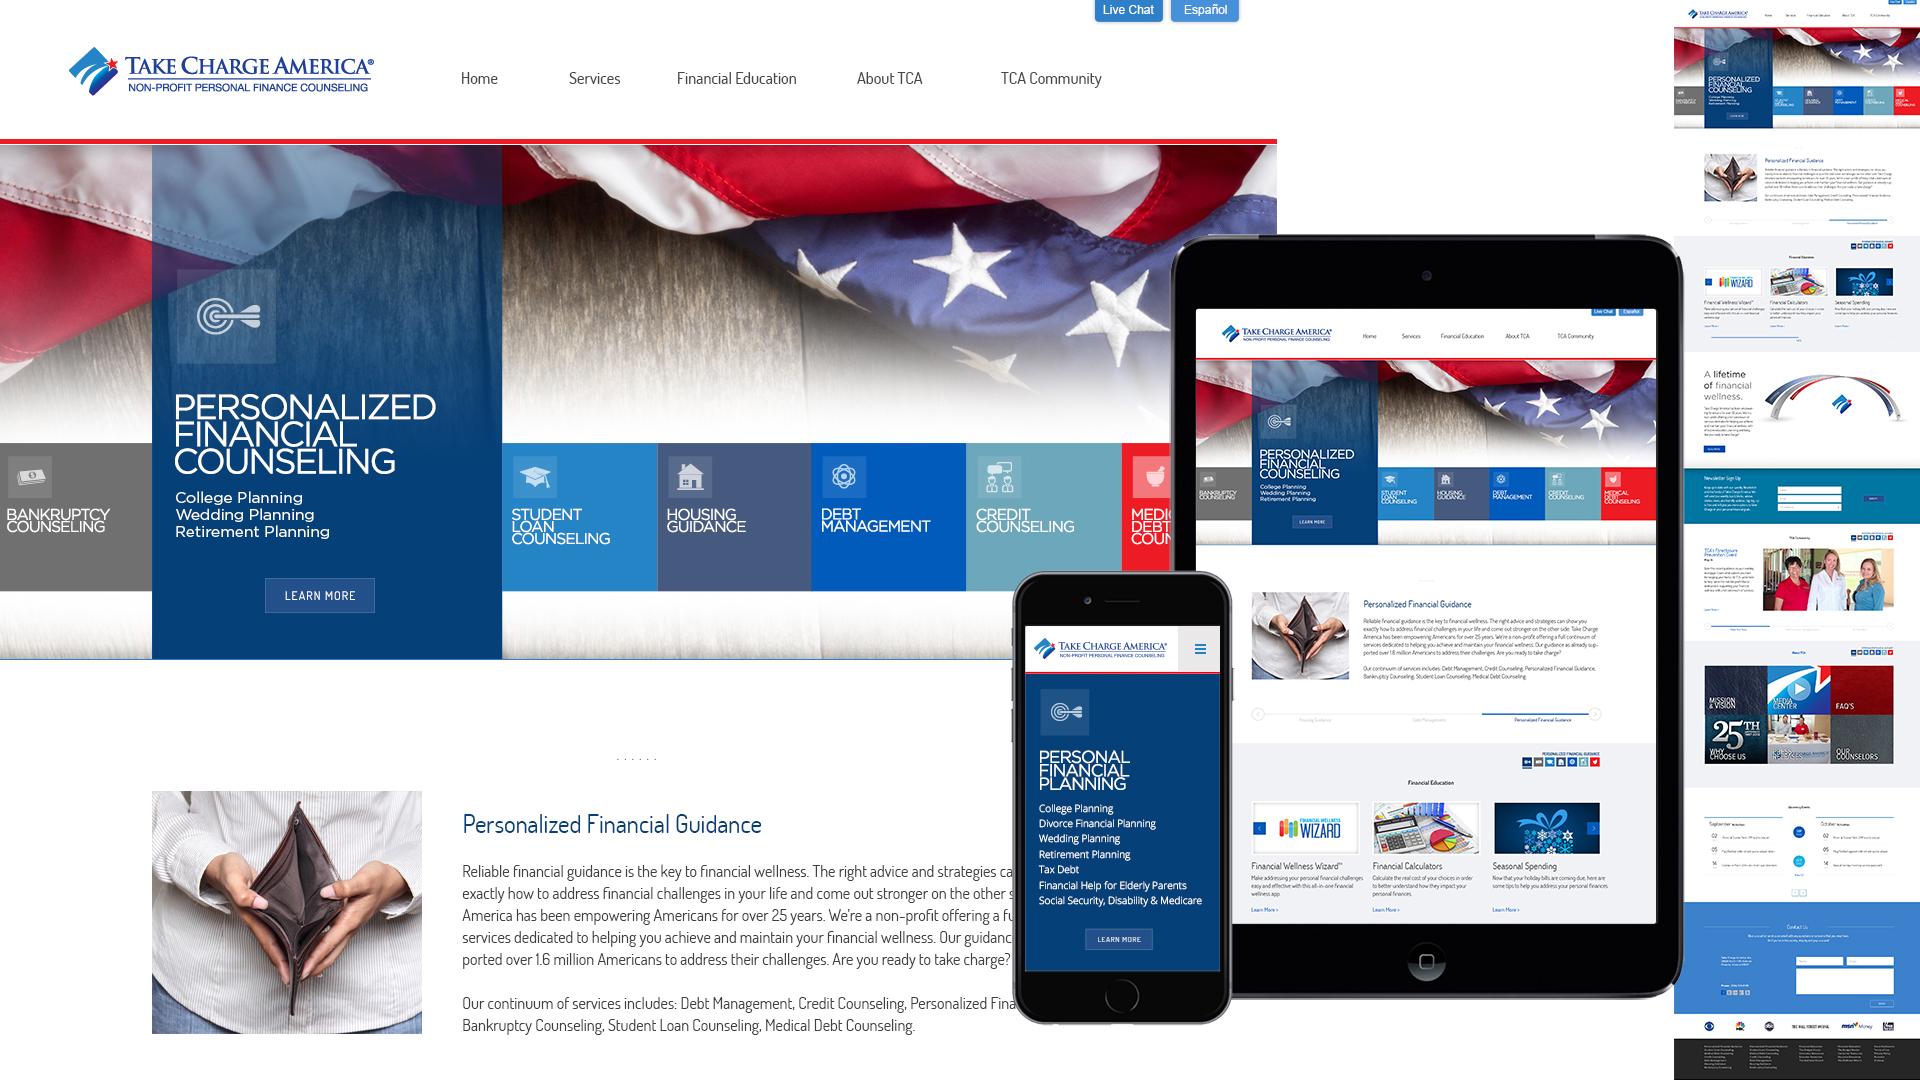 Responsive design, UX design, Information Architecture, brand identity